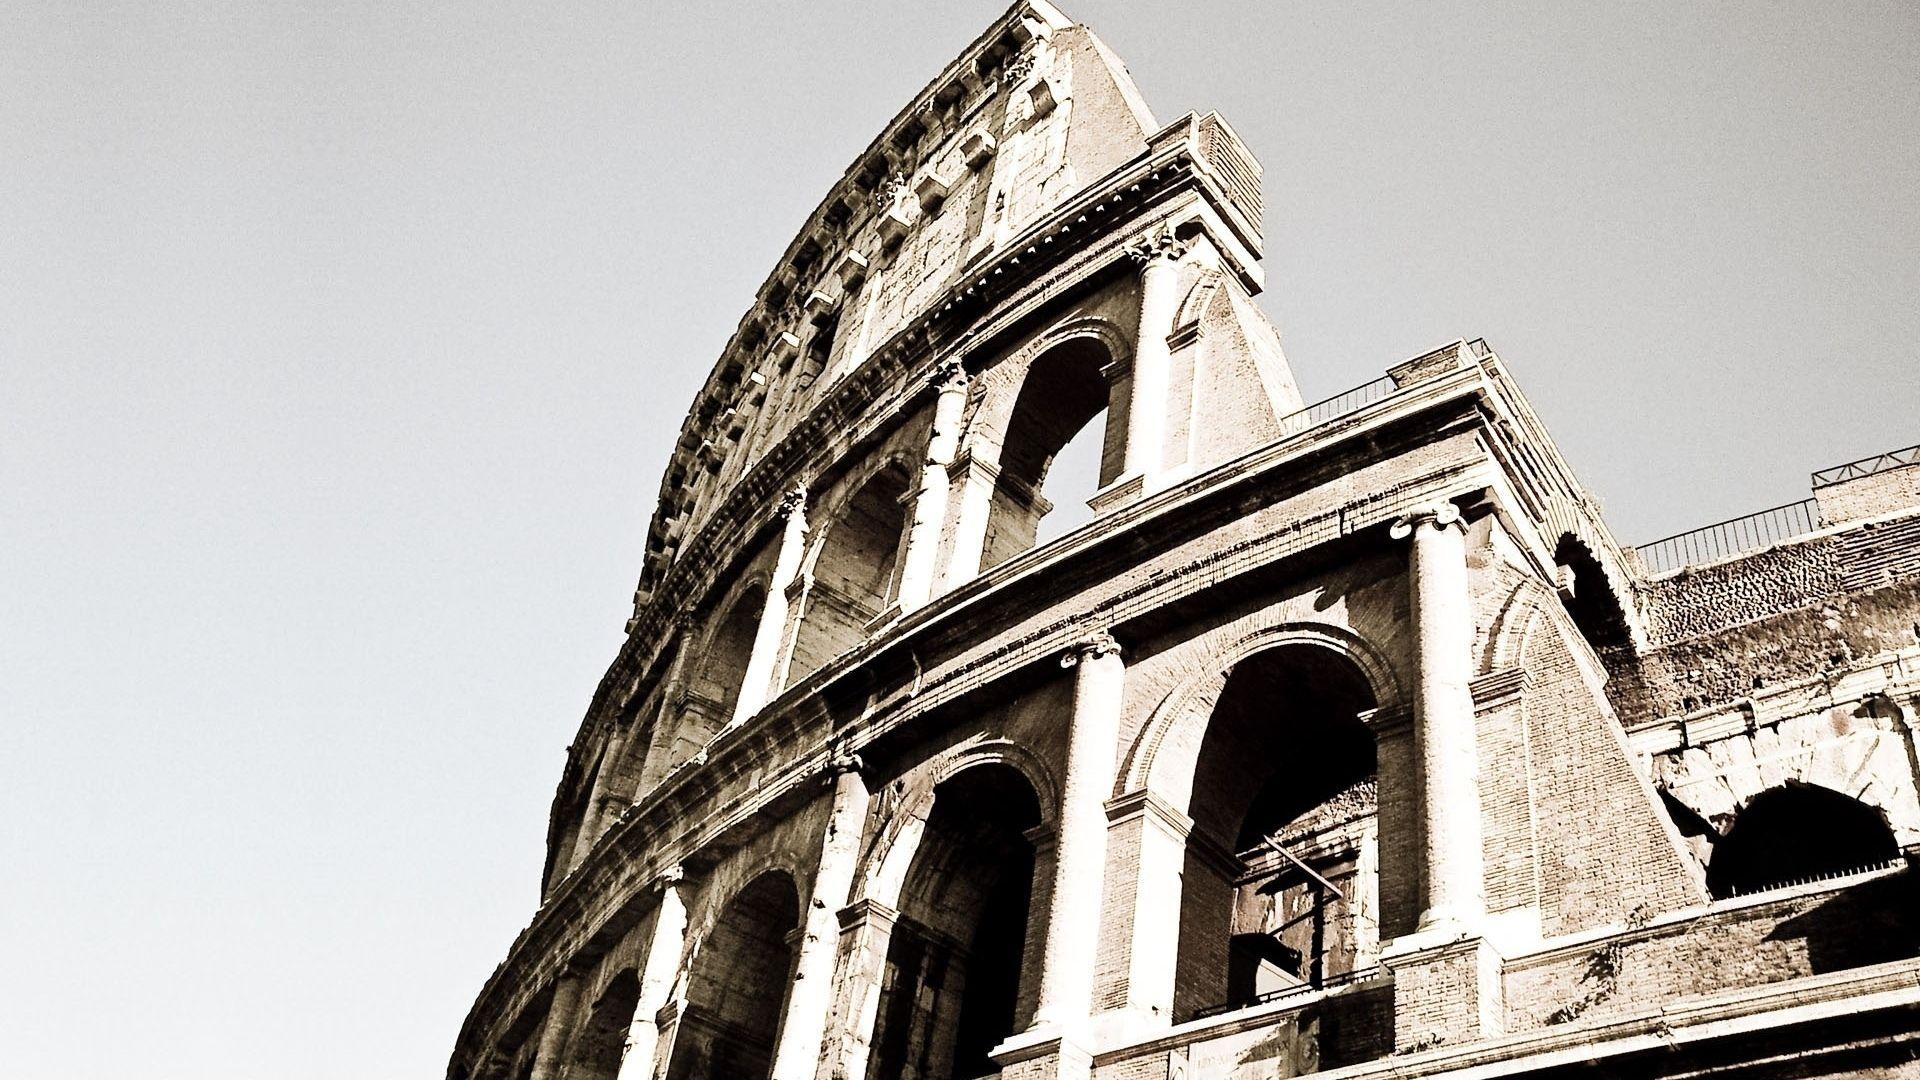 Colosseum Black And White Photo